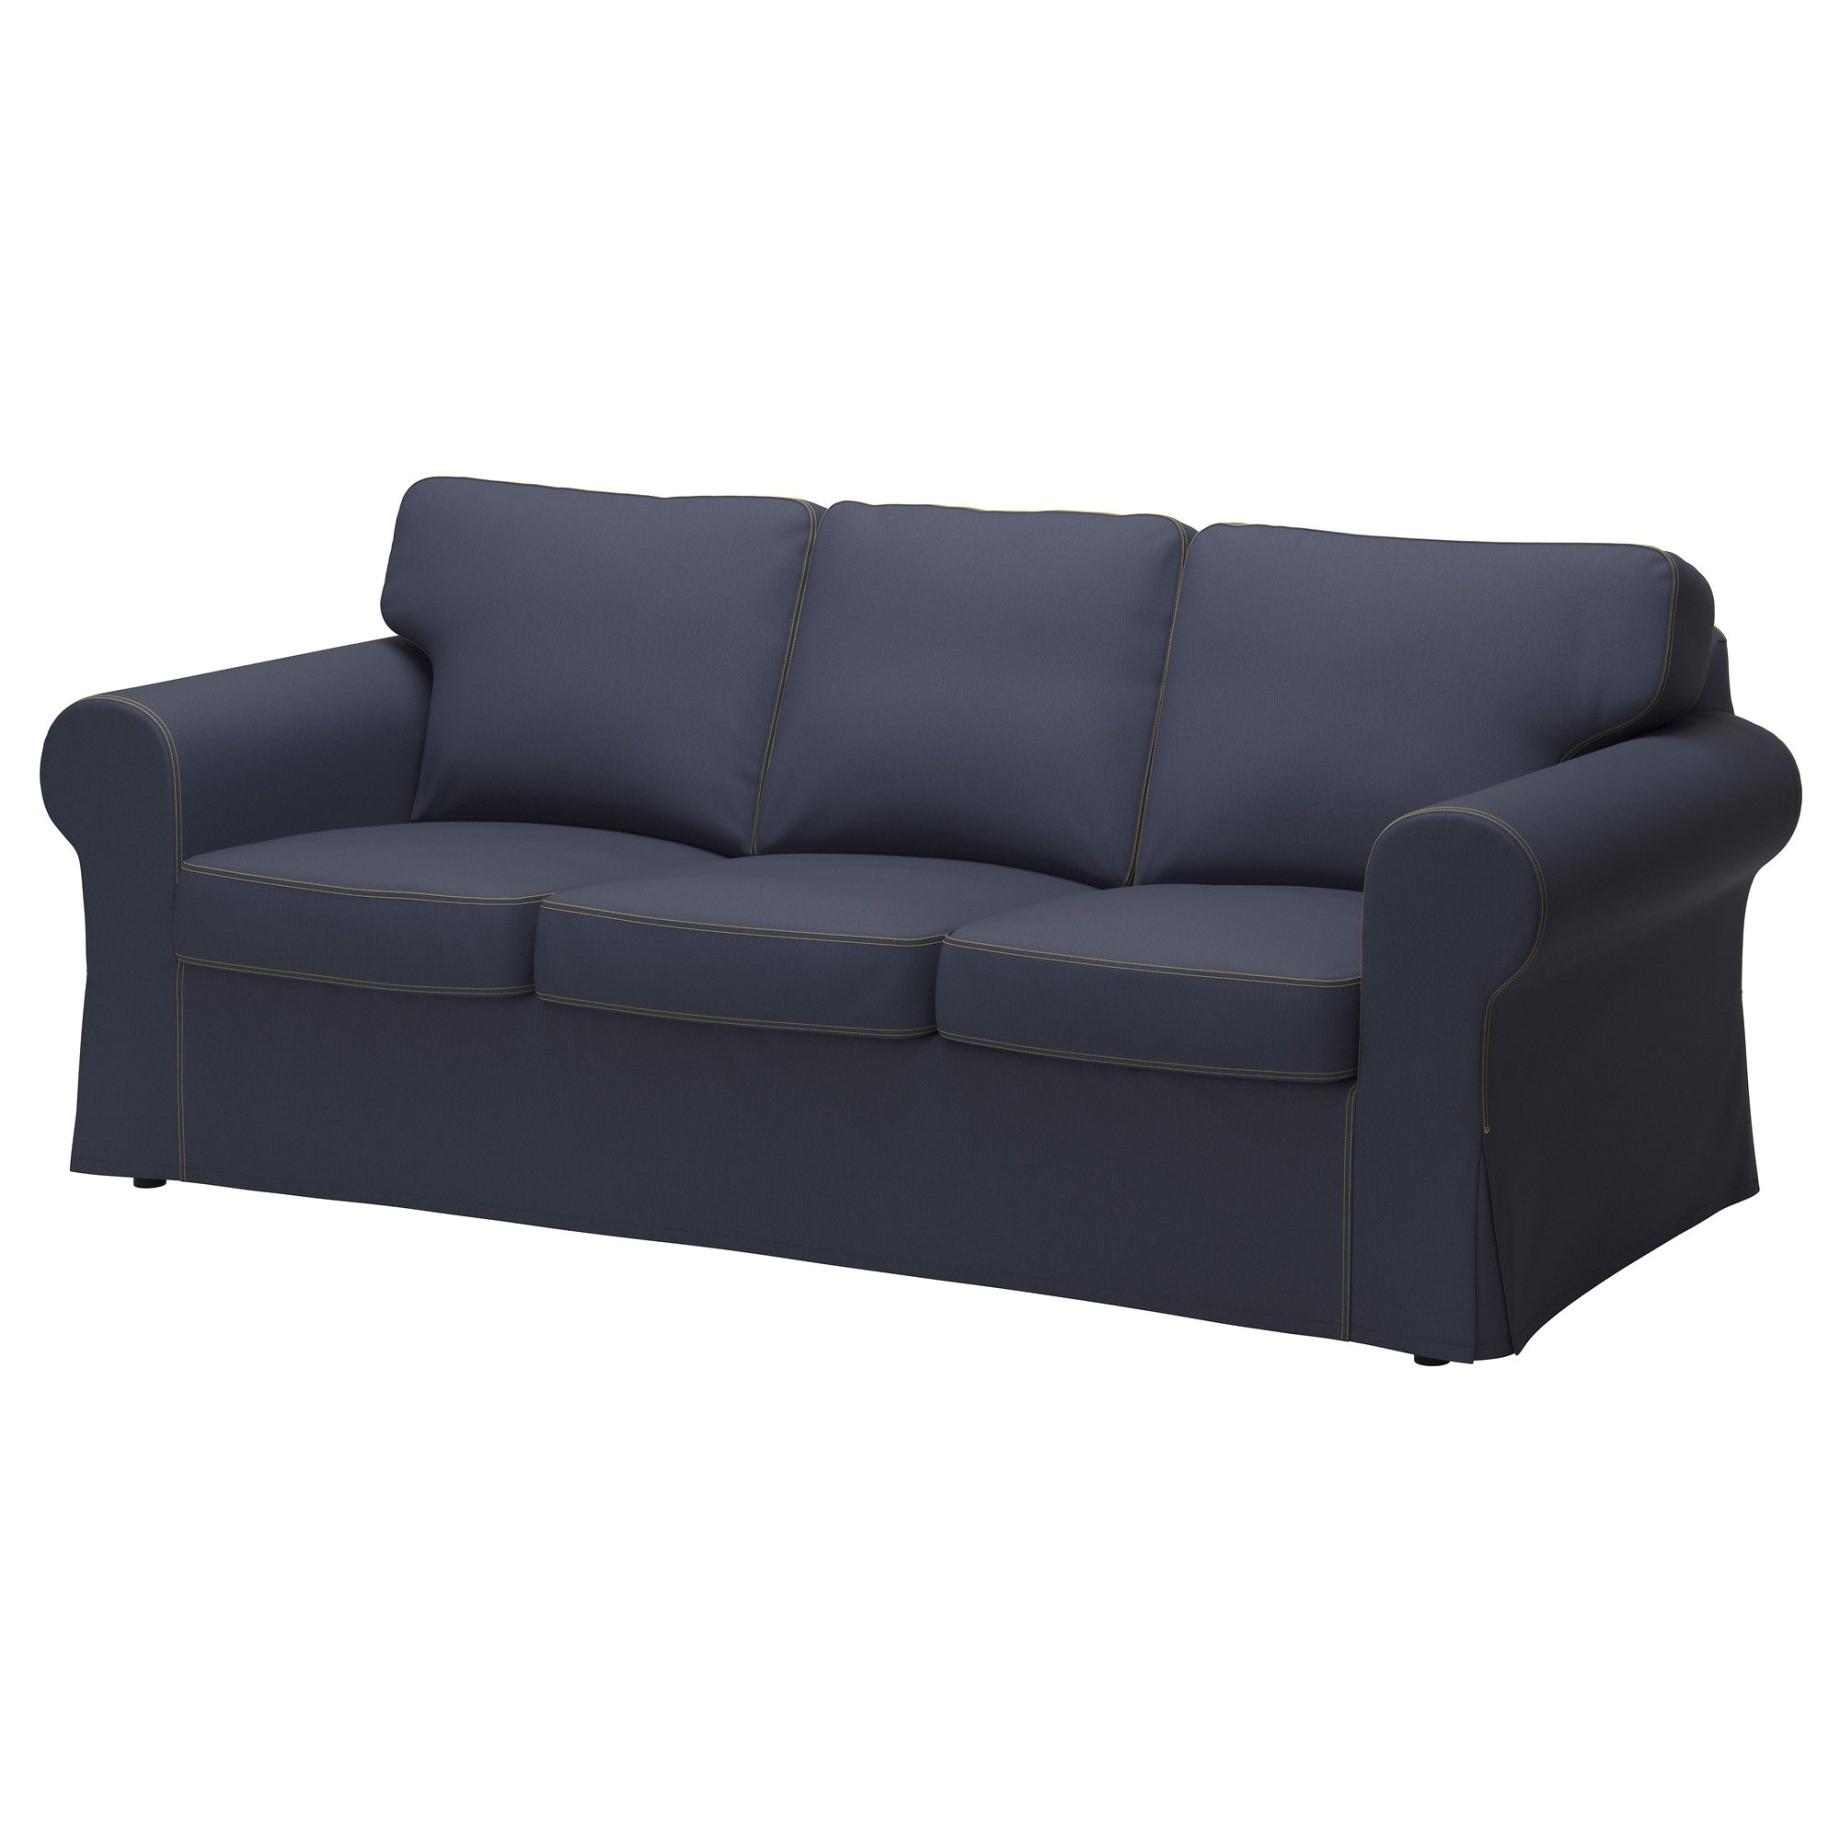 ektorp sofa cover jonsboda blue ikea 499 99 couch slipcover